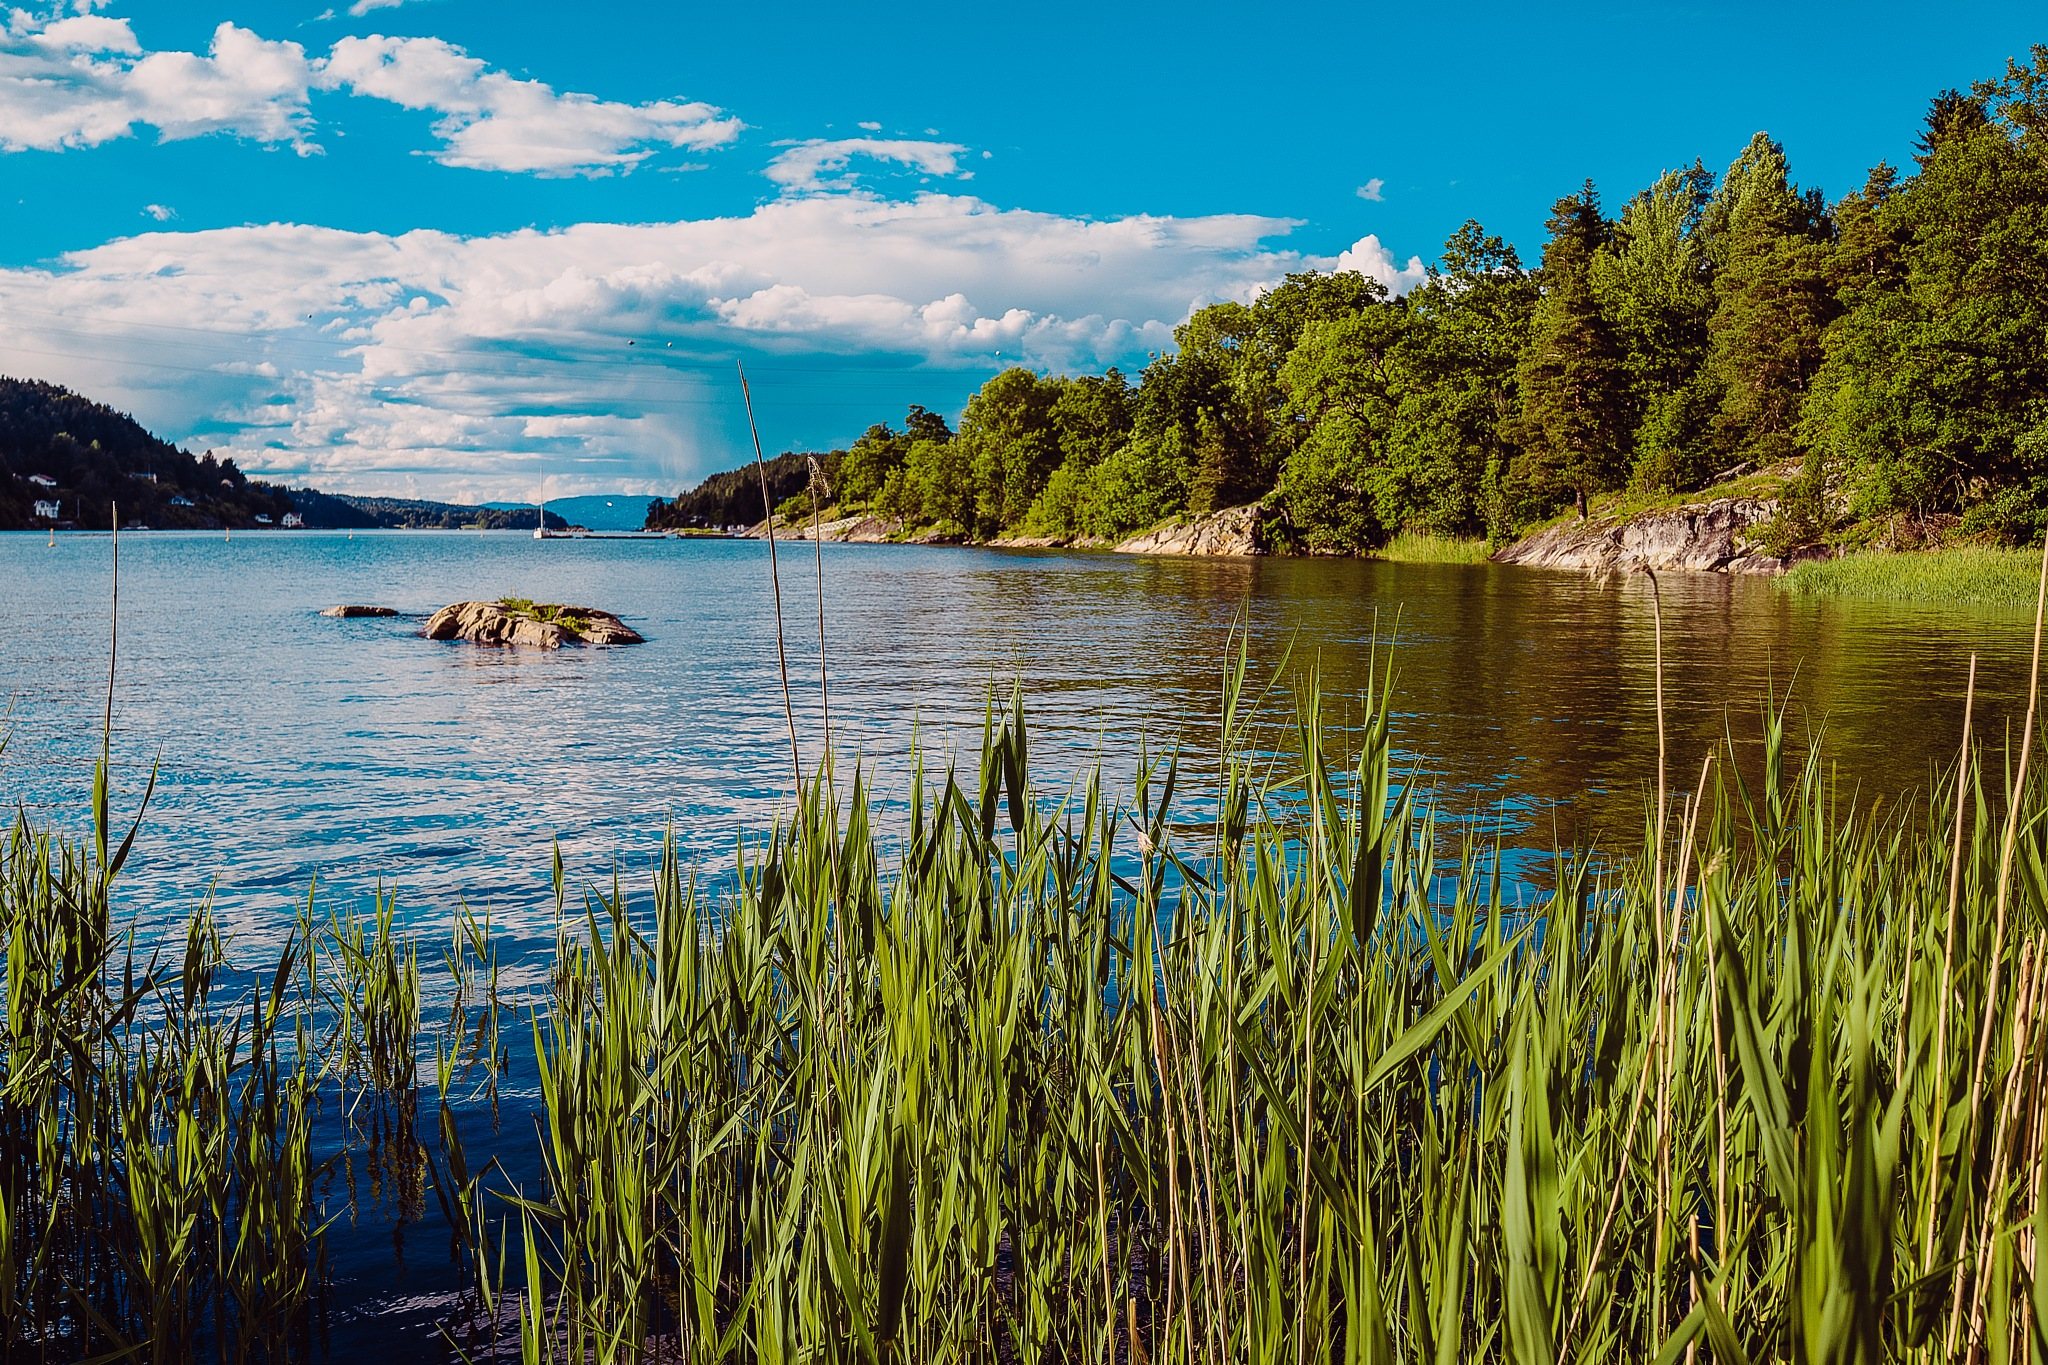 Summer in Scandinavia - OSLO FJORD by Goran Jorganovich